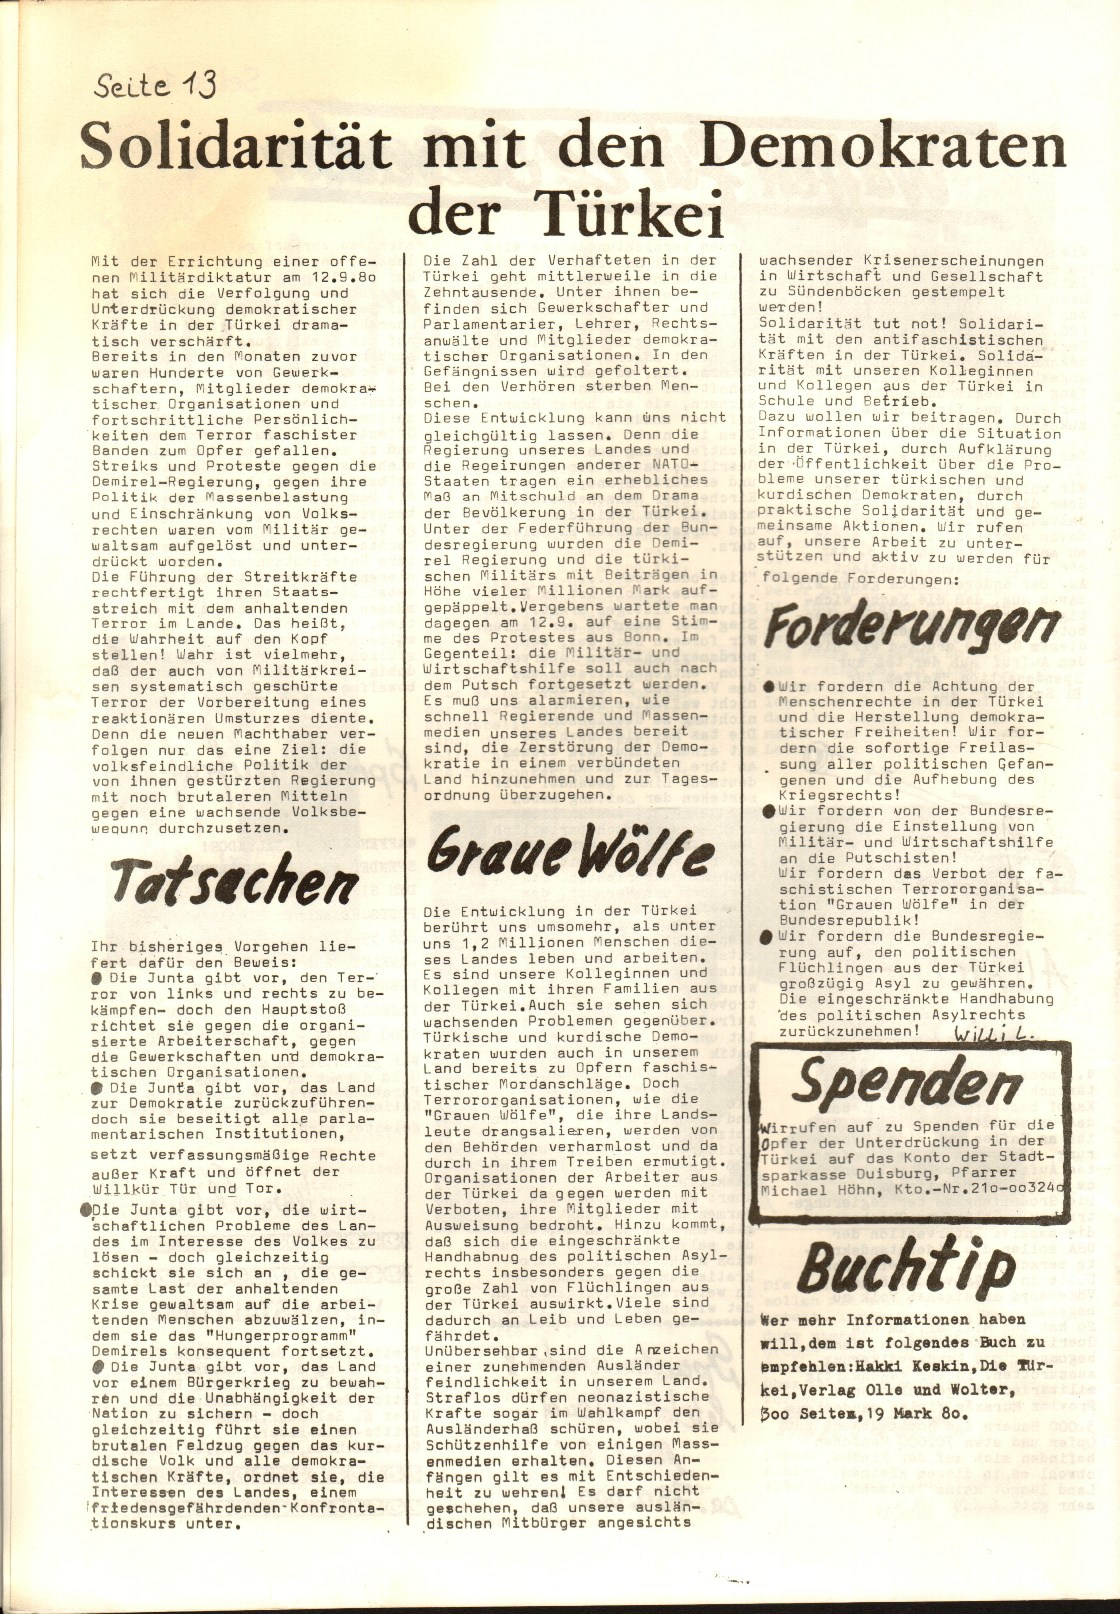 Gelsenkirchen_Emscherbote_1981_04_14